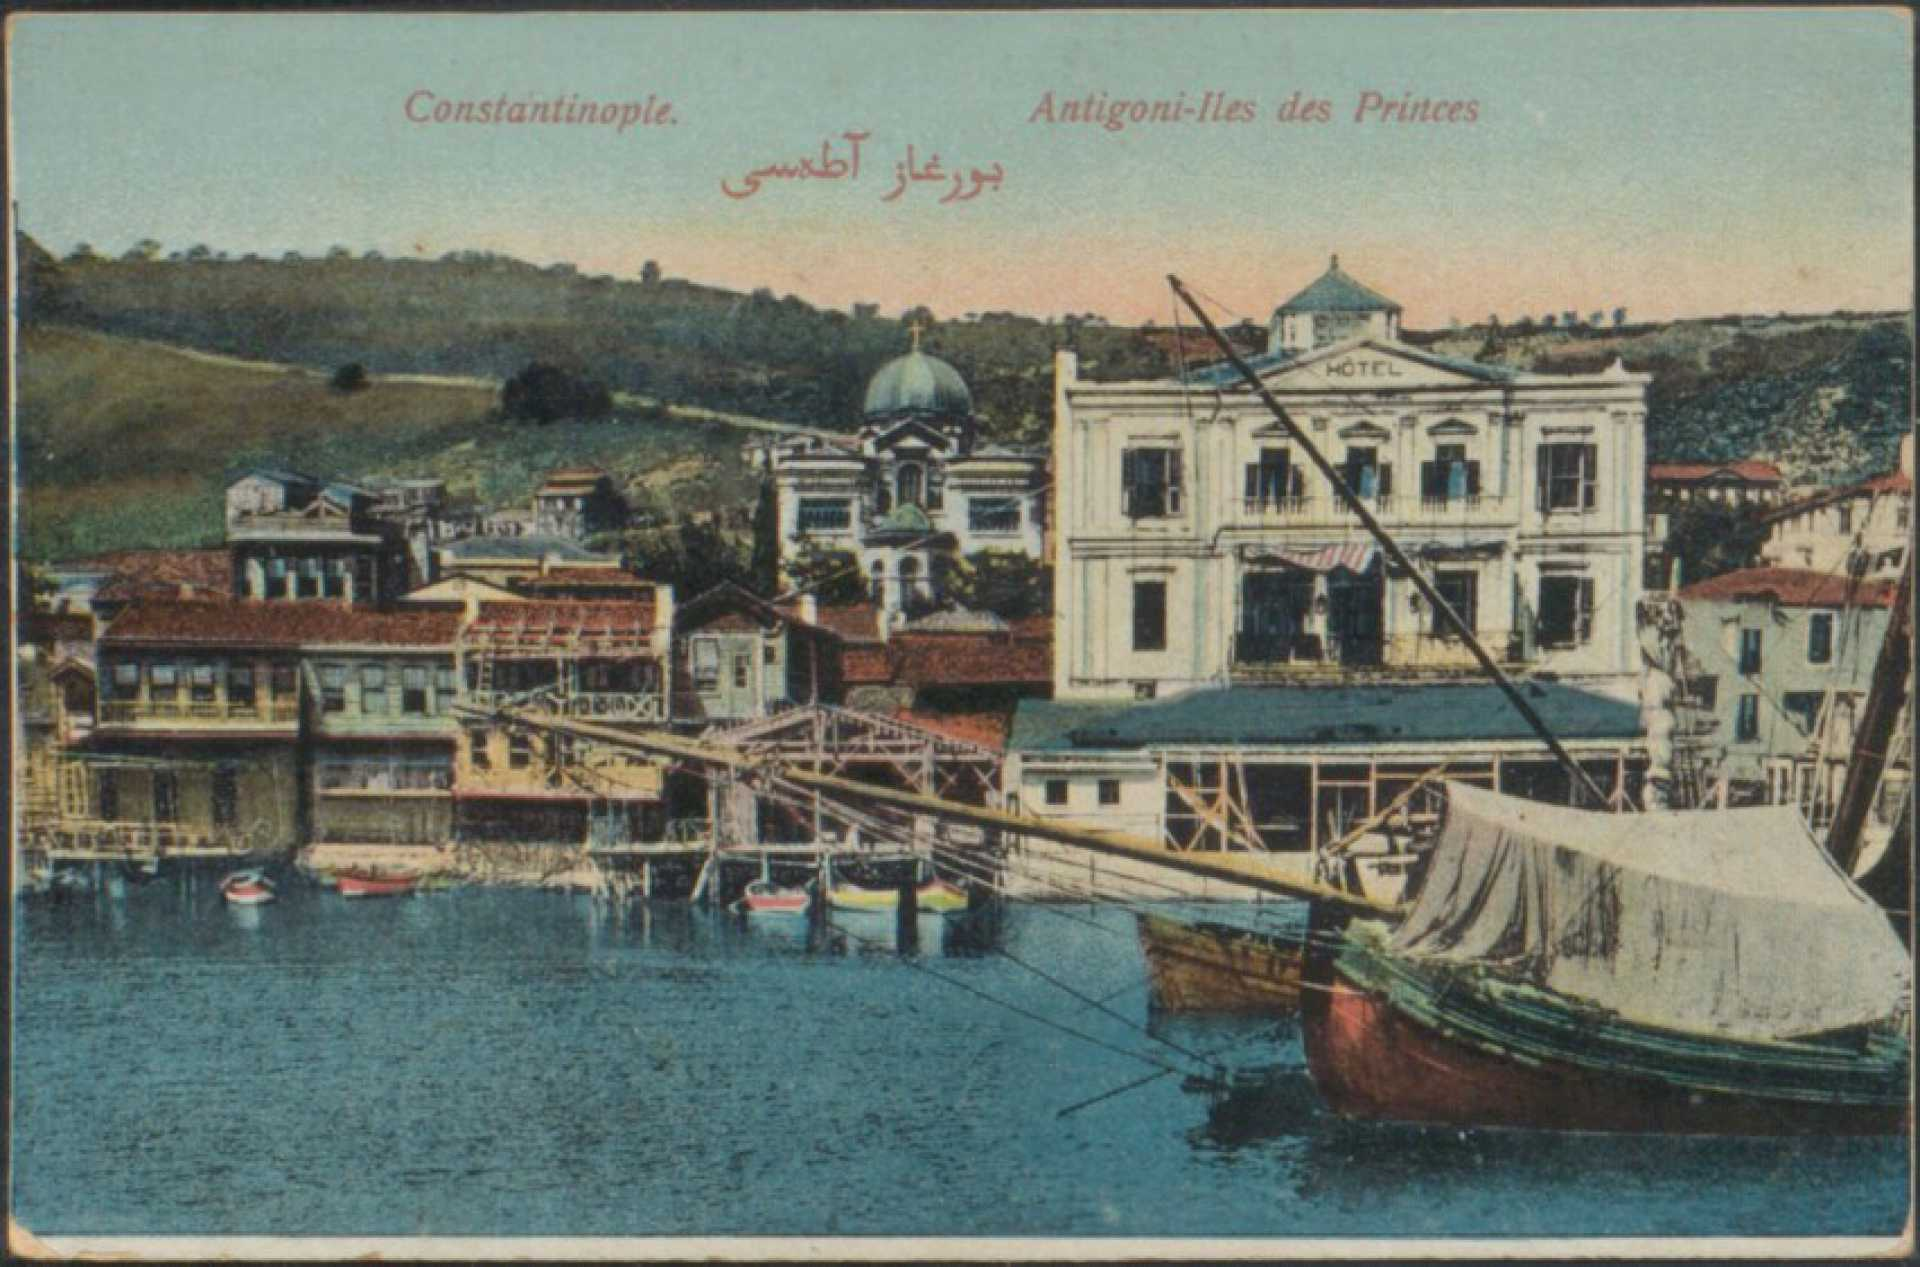 Antigoni-Illes des Princes